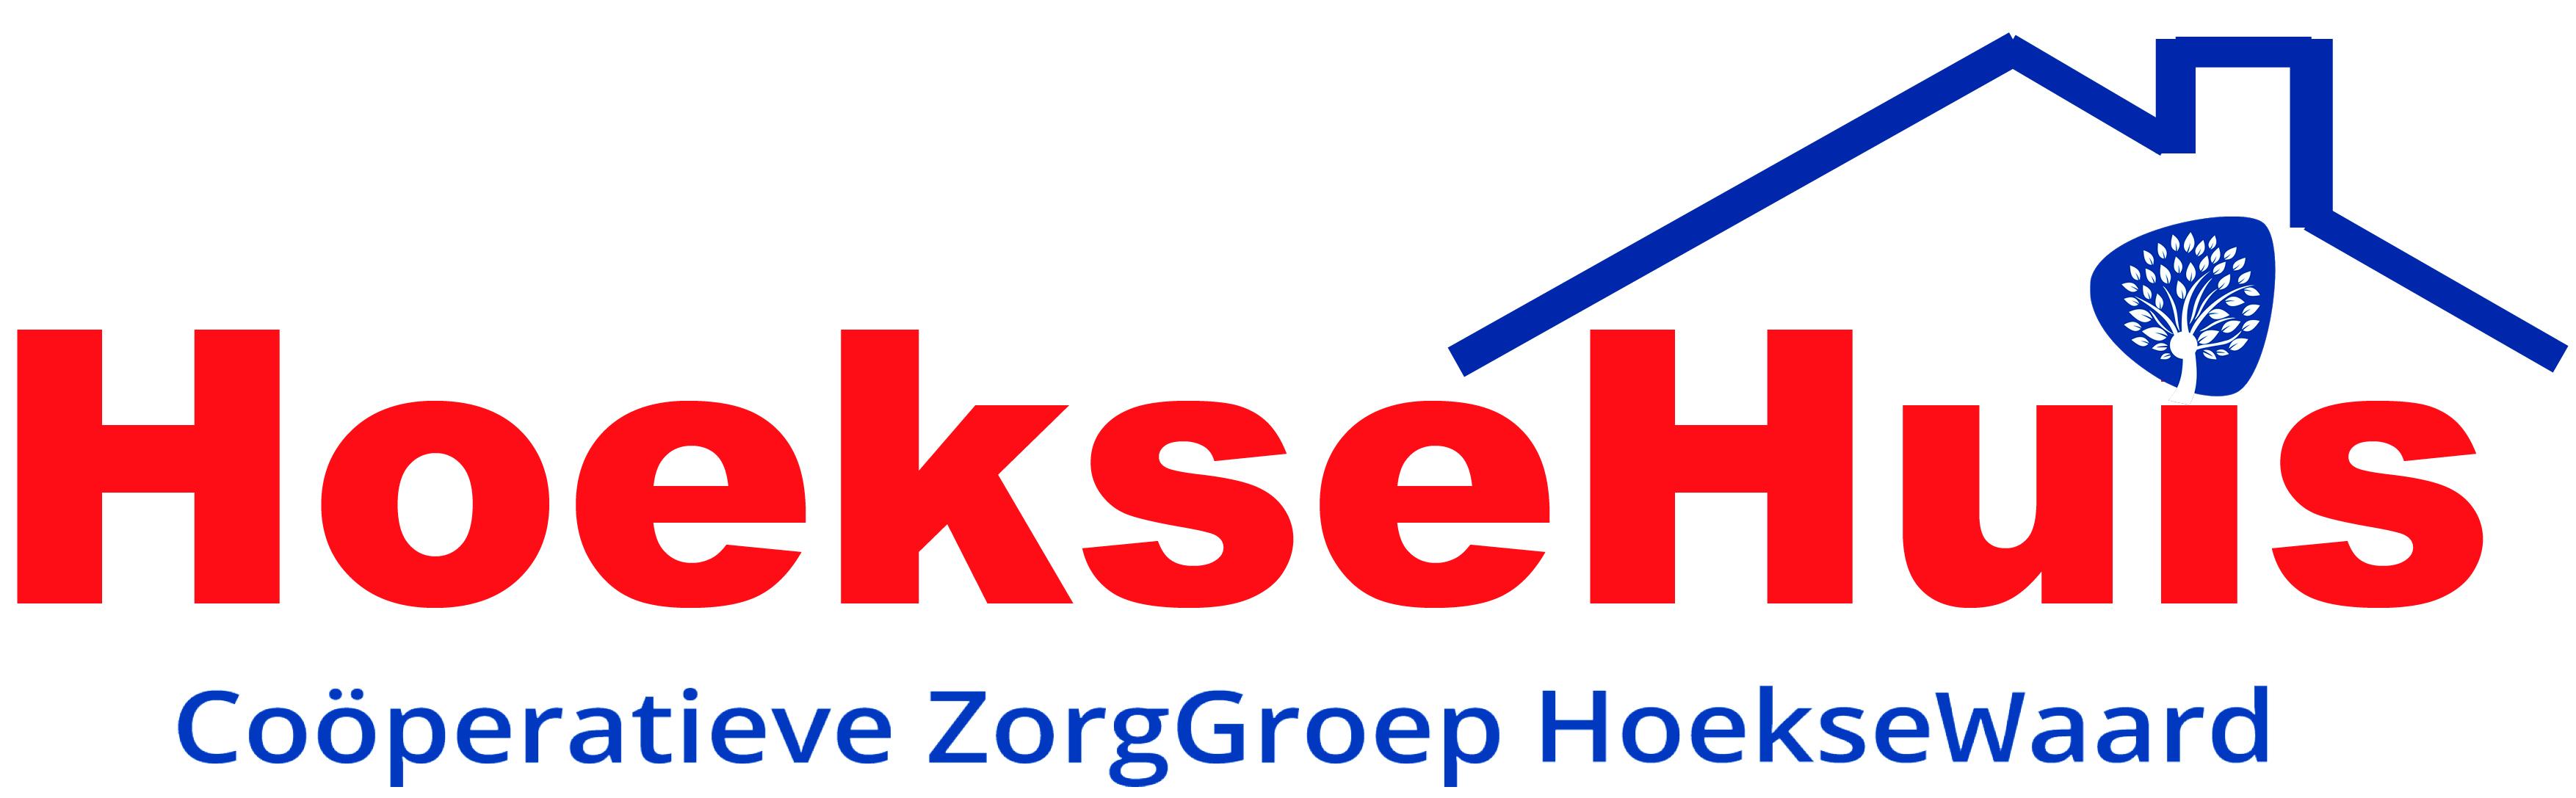 Logo HoekseHuis